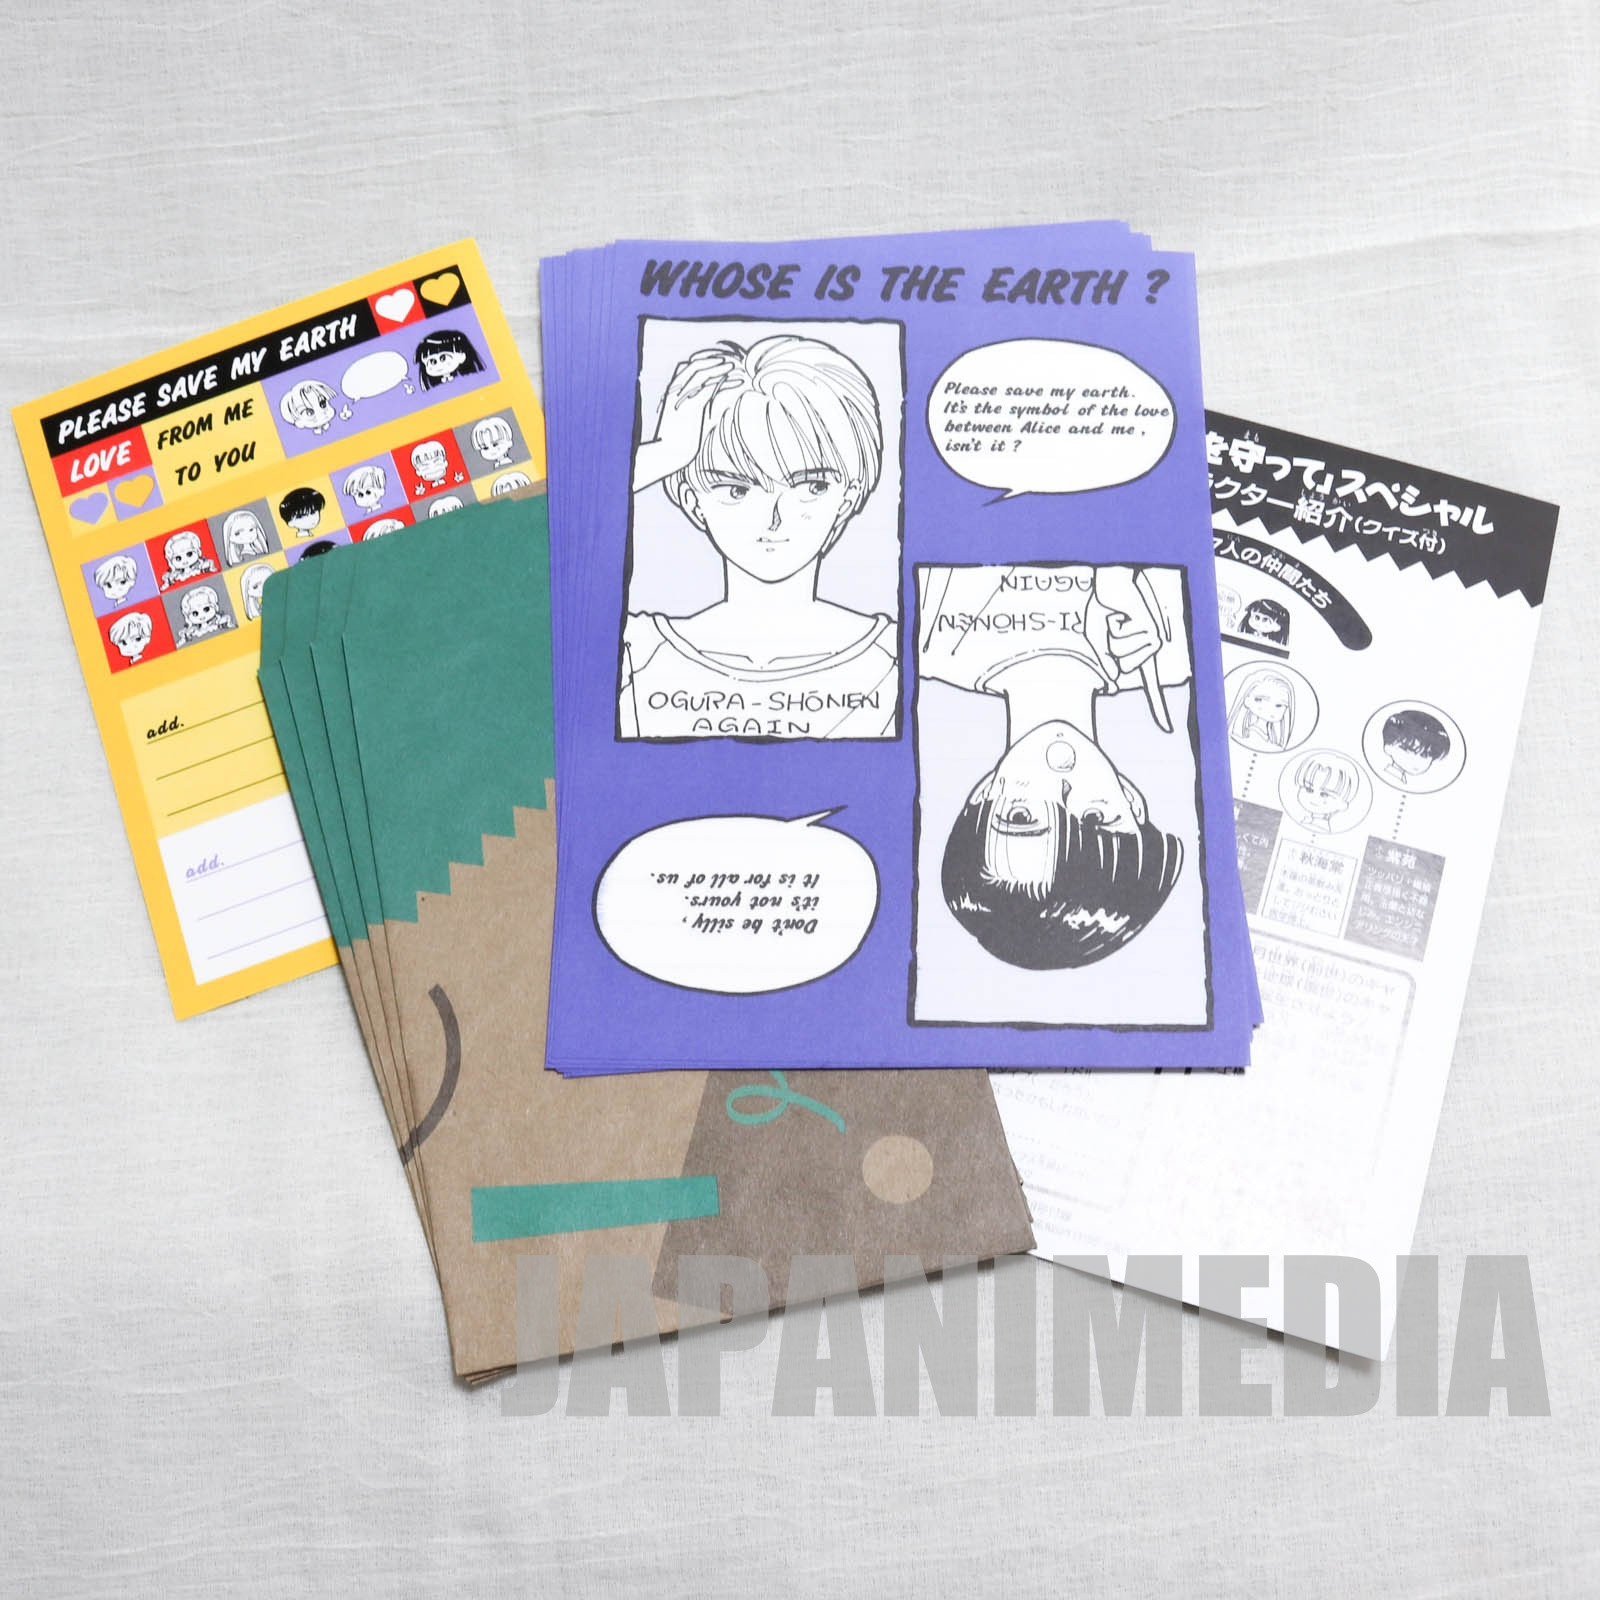 [Retro Rare!!] Please Save My Earth Letter writing set [Envelope 4pc + Paper 8pc + Sticker] JAPAN MANGA